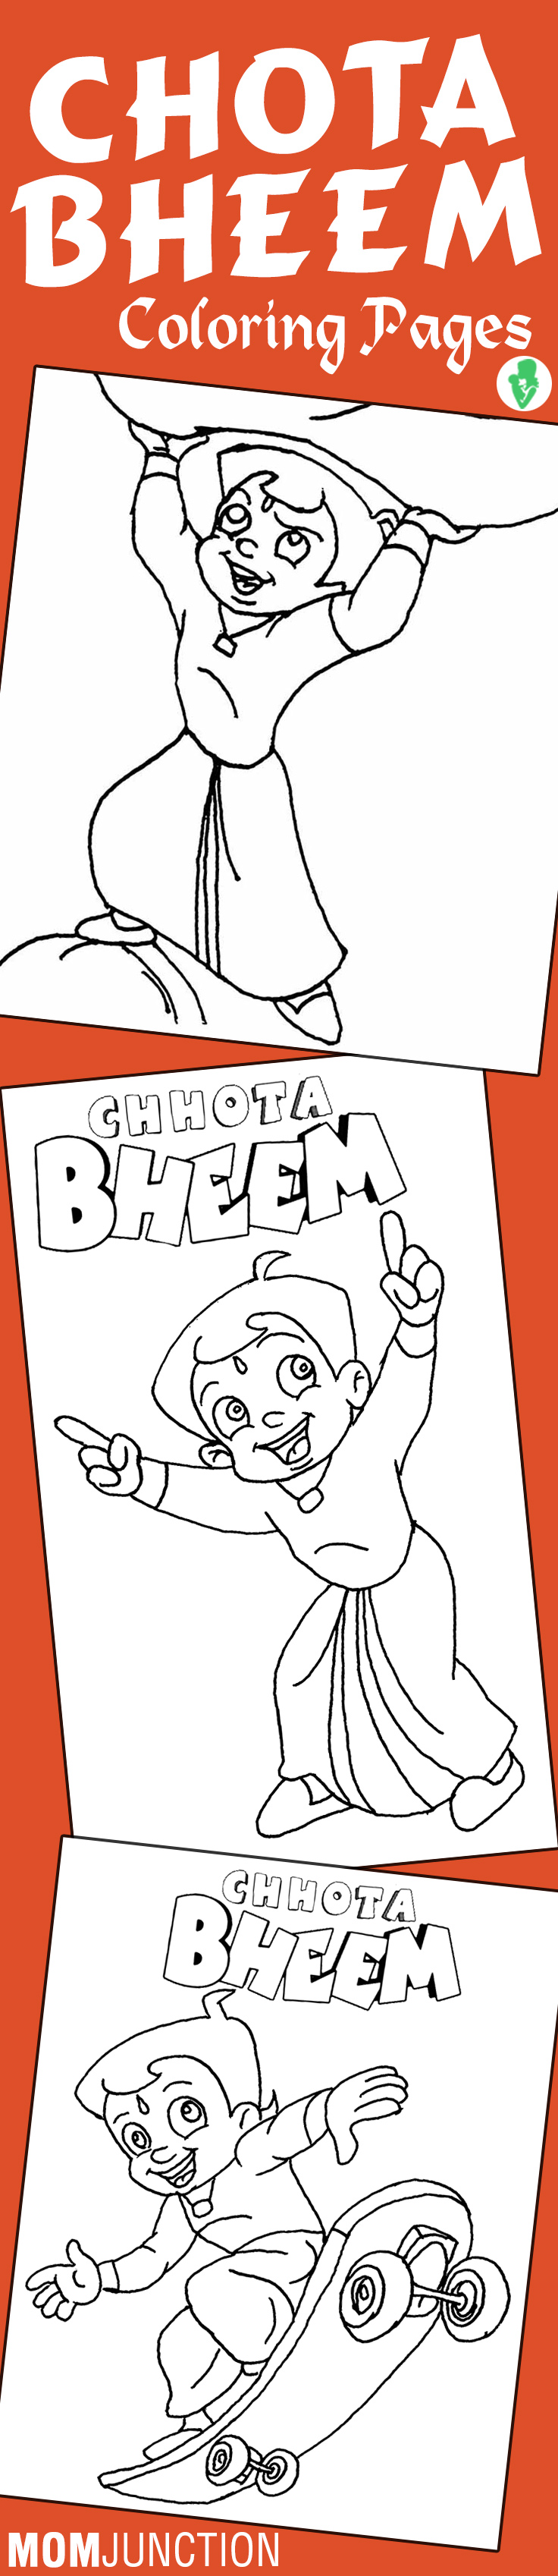 Online Coloring Chota Bheem : Top free printable chota bheem coloring pages